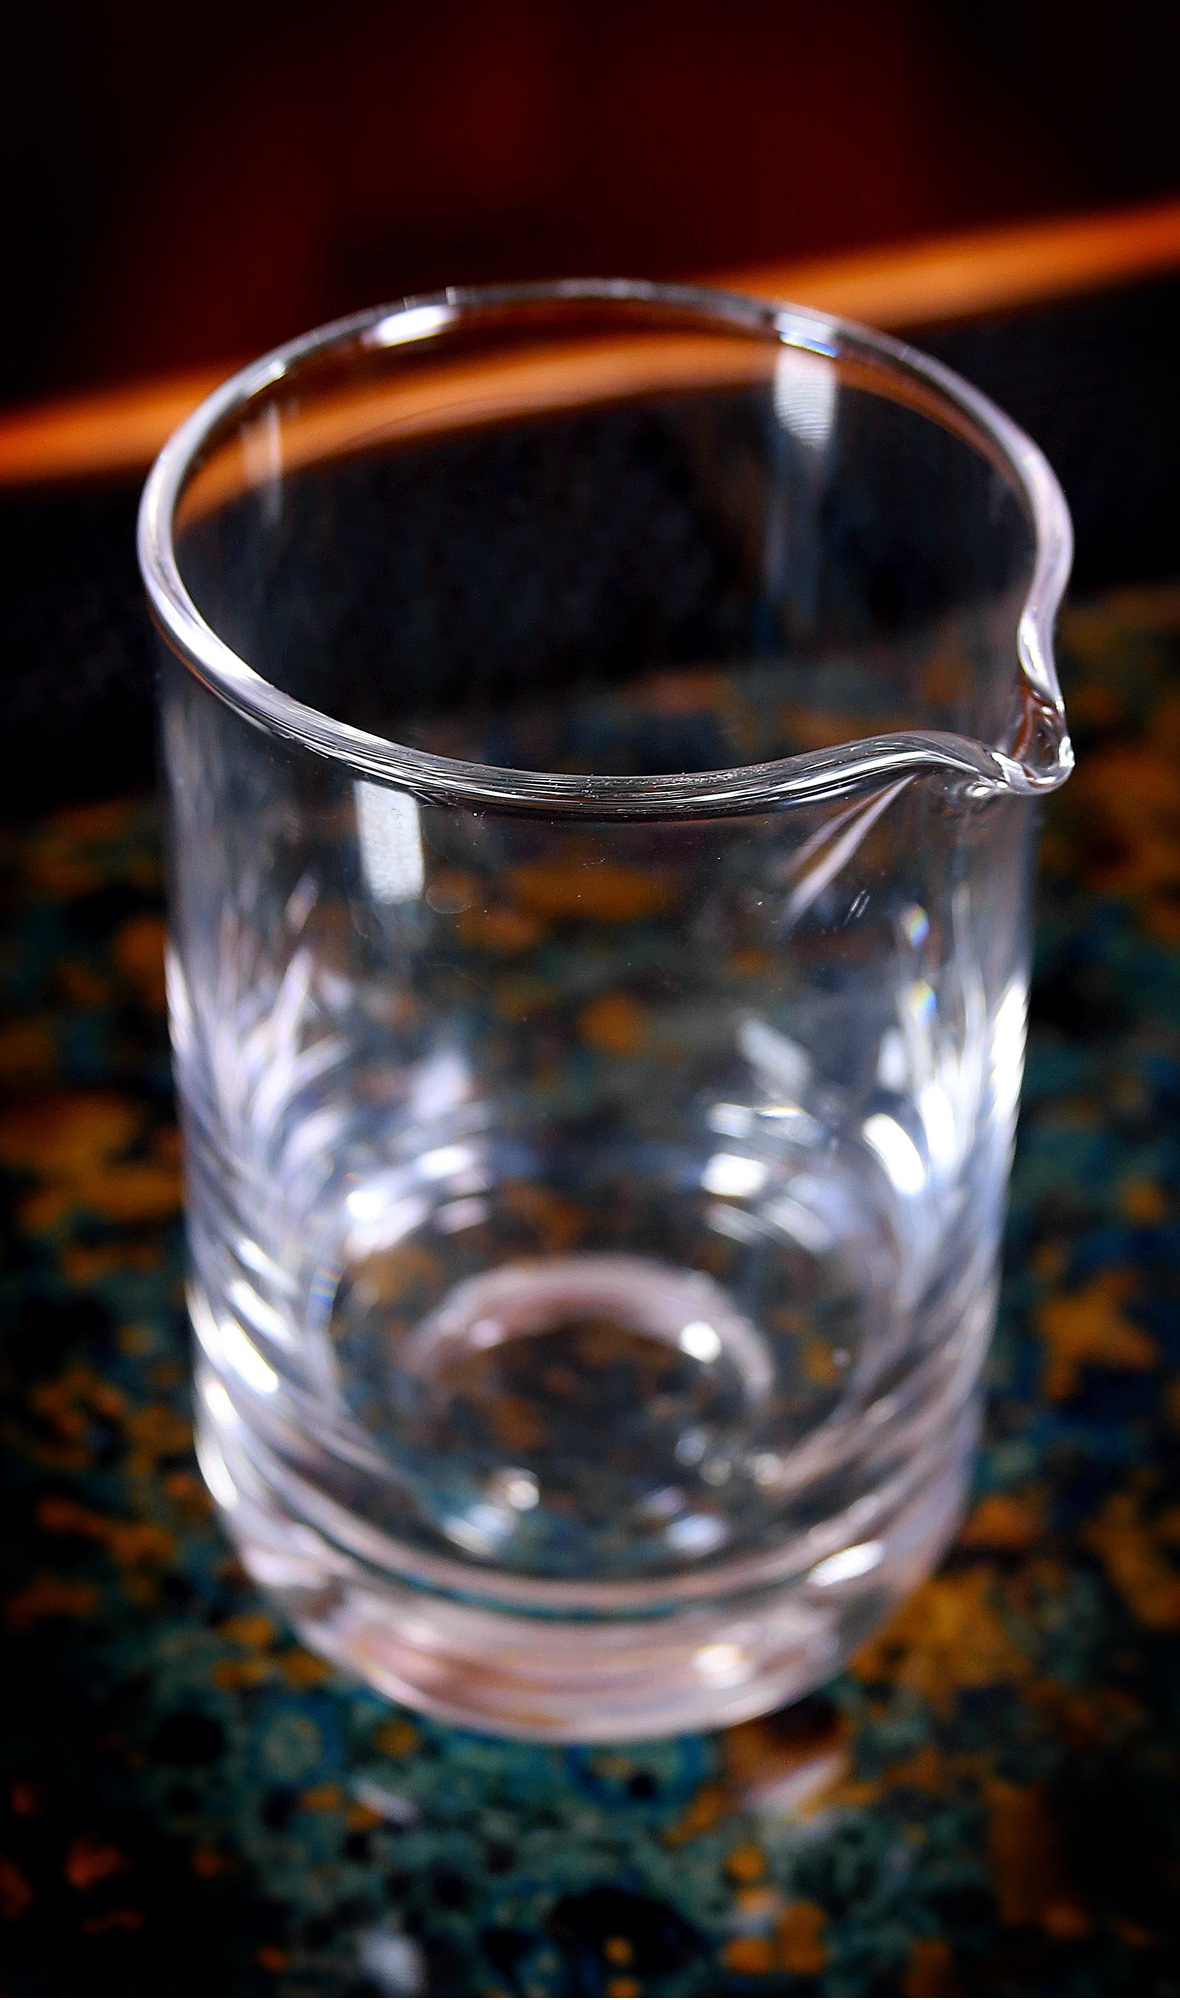 20 oz Mixing Glass